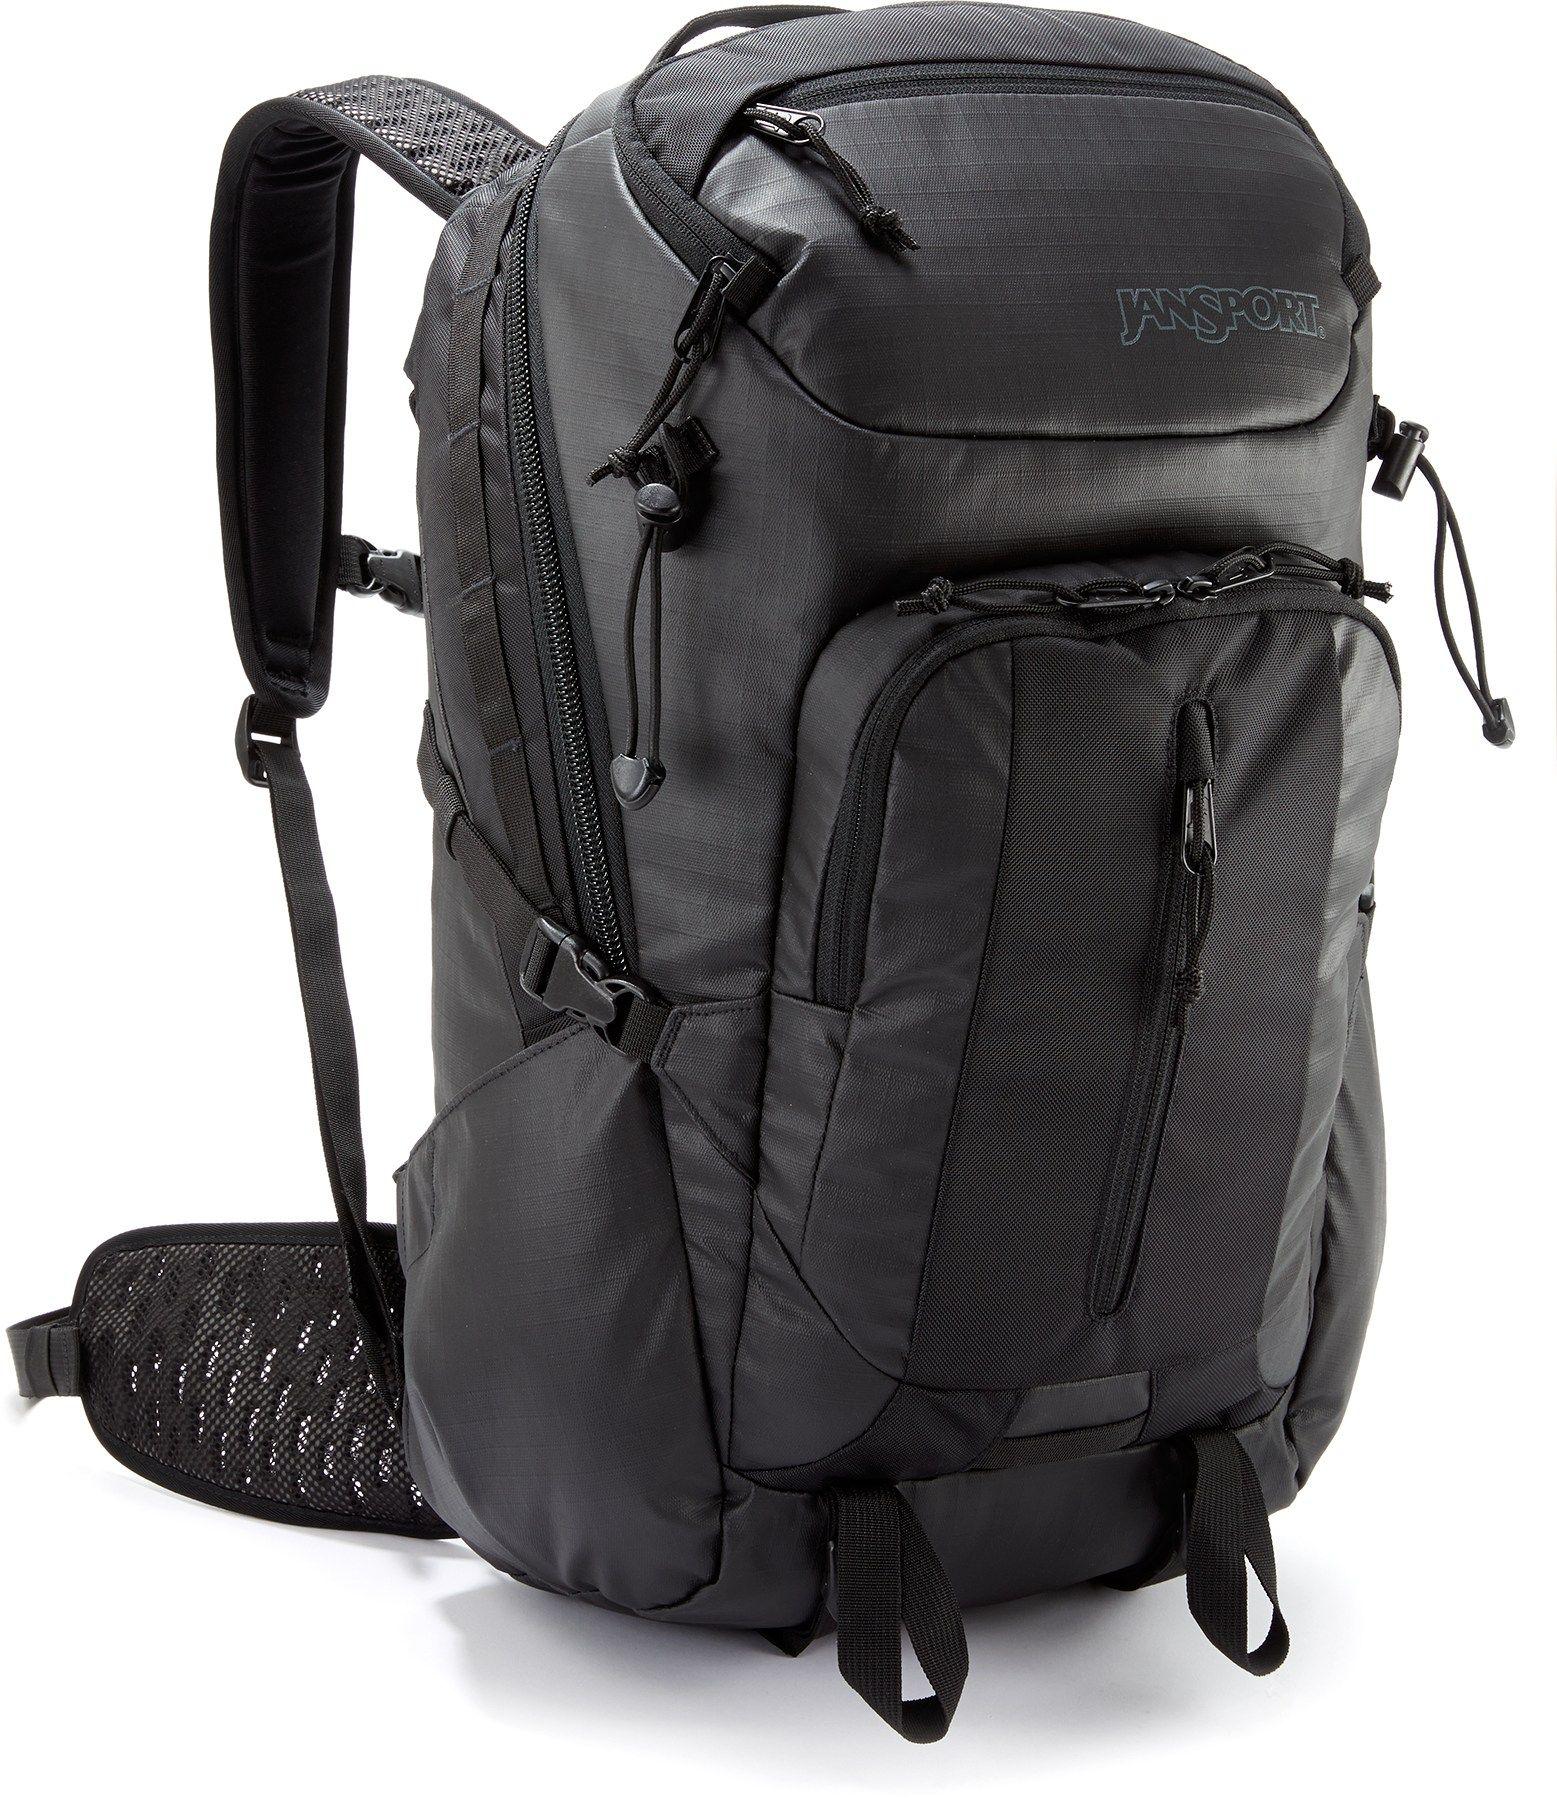 JanSport Onyx 34 Travel Pack Black Onyx | JanSport, Backpacks and Bag